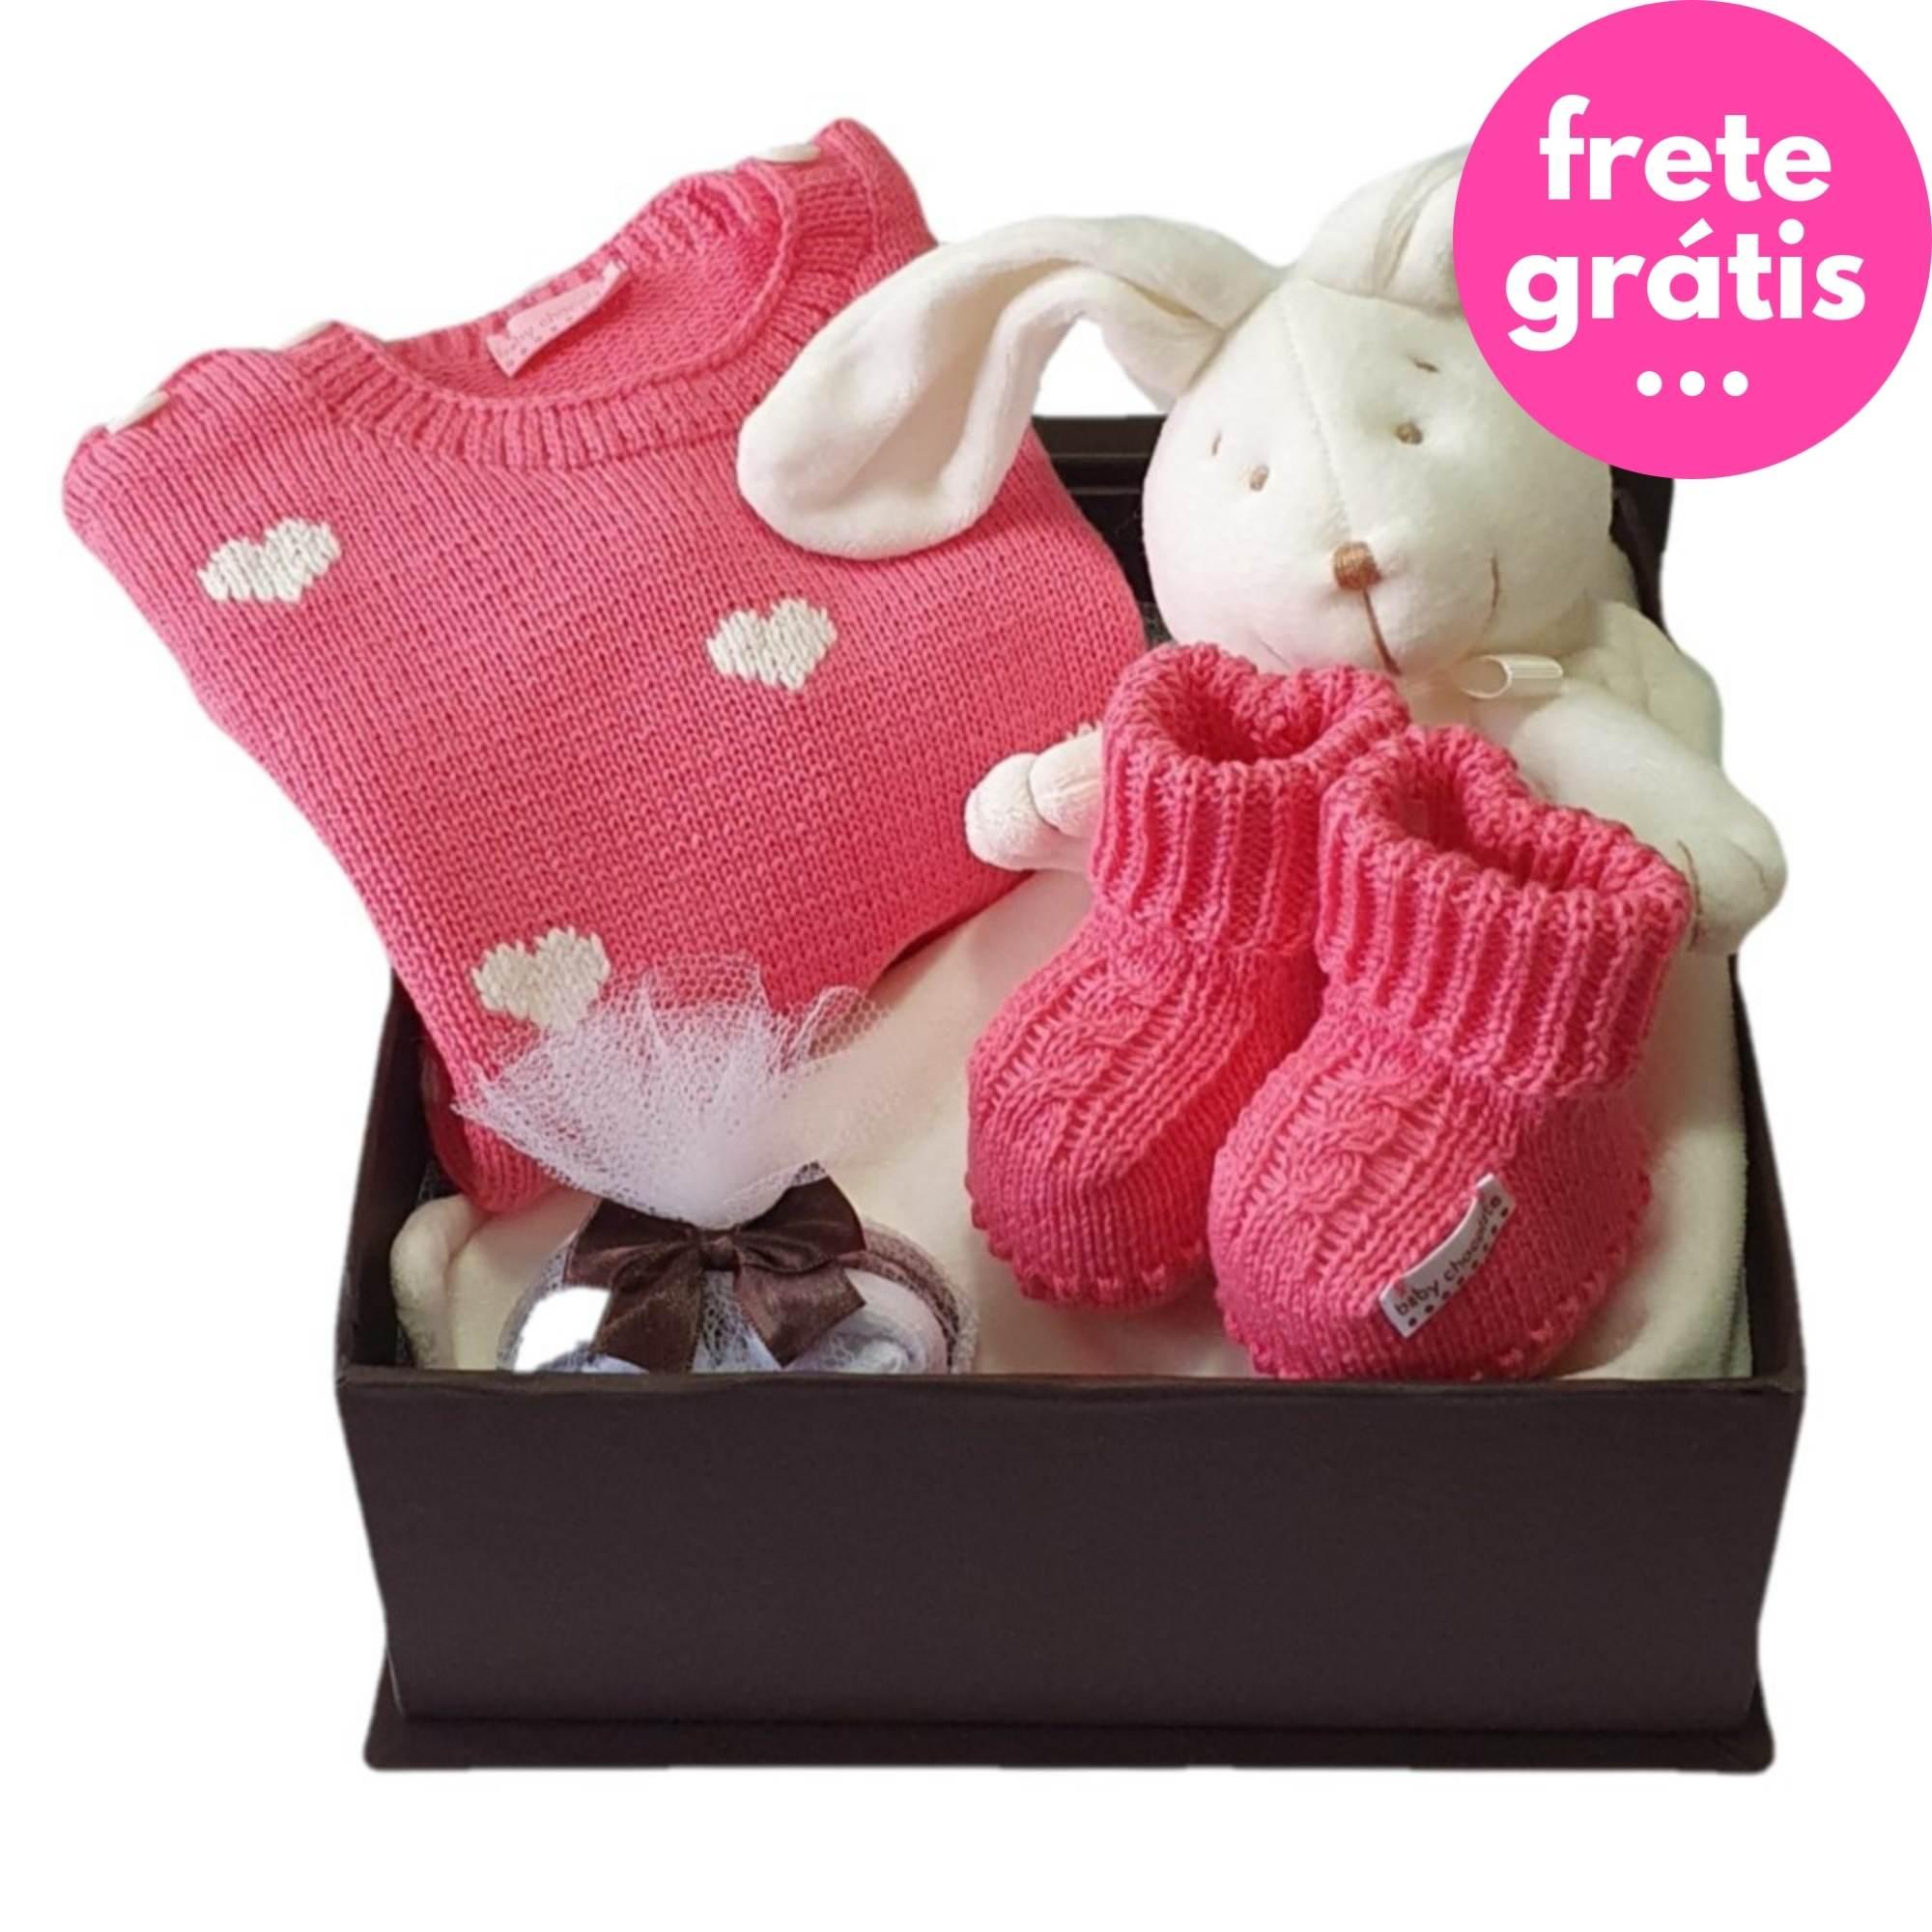 Kit Presente Baby Naninha Premium Candy - 4 peças